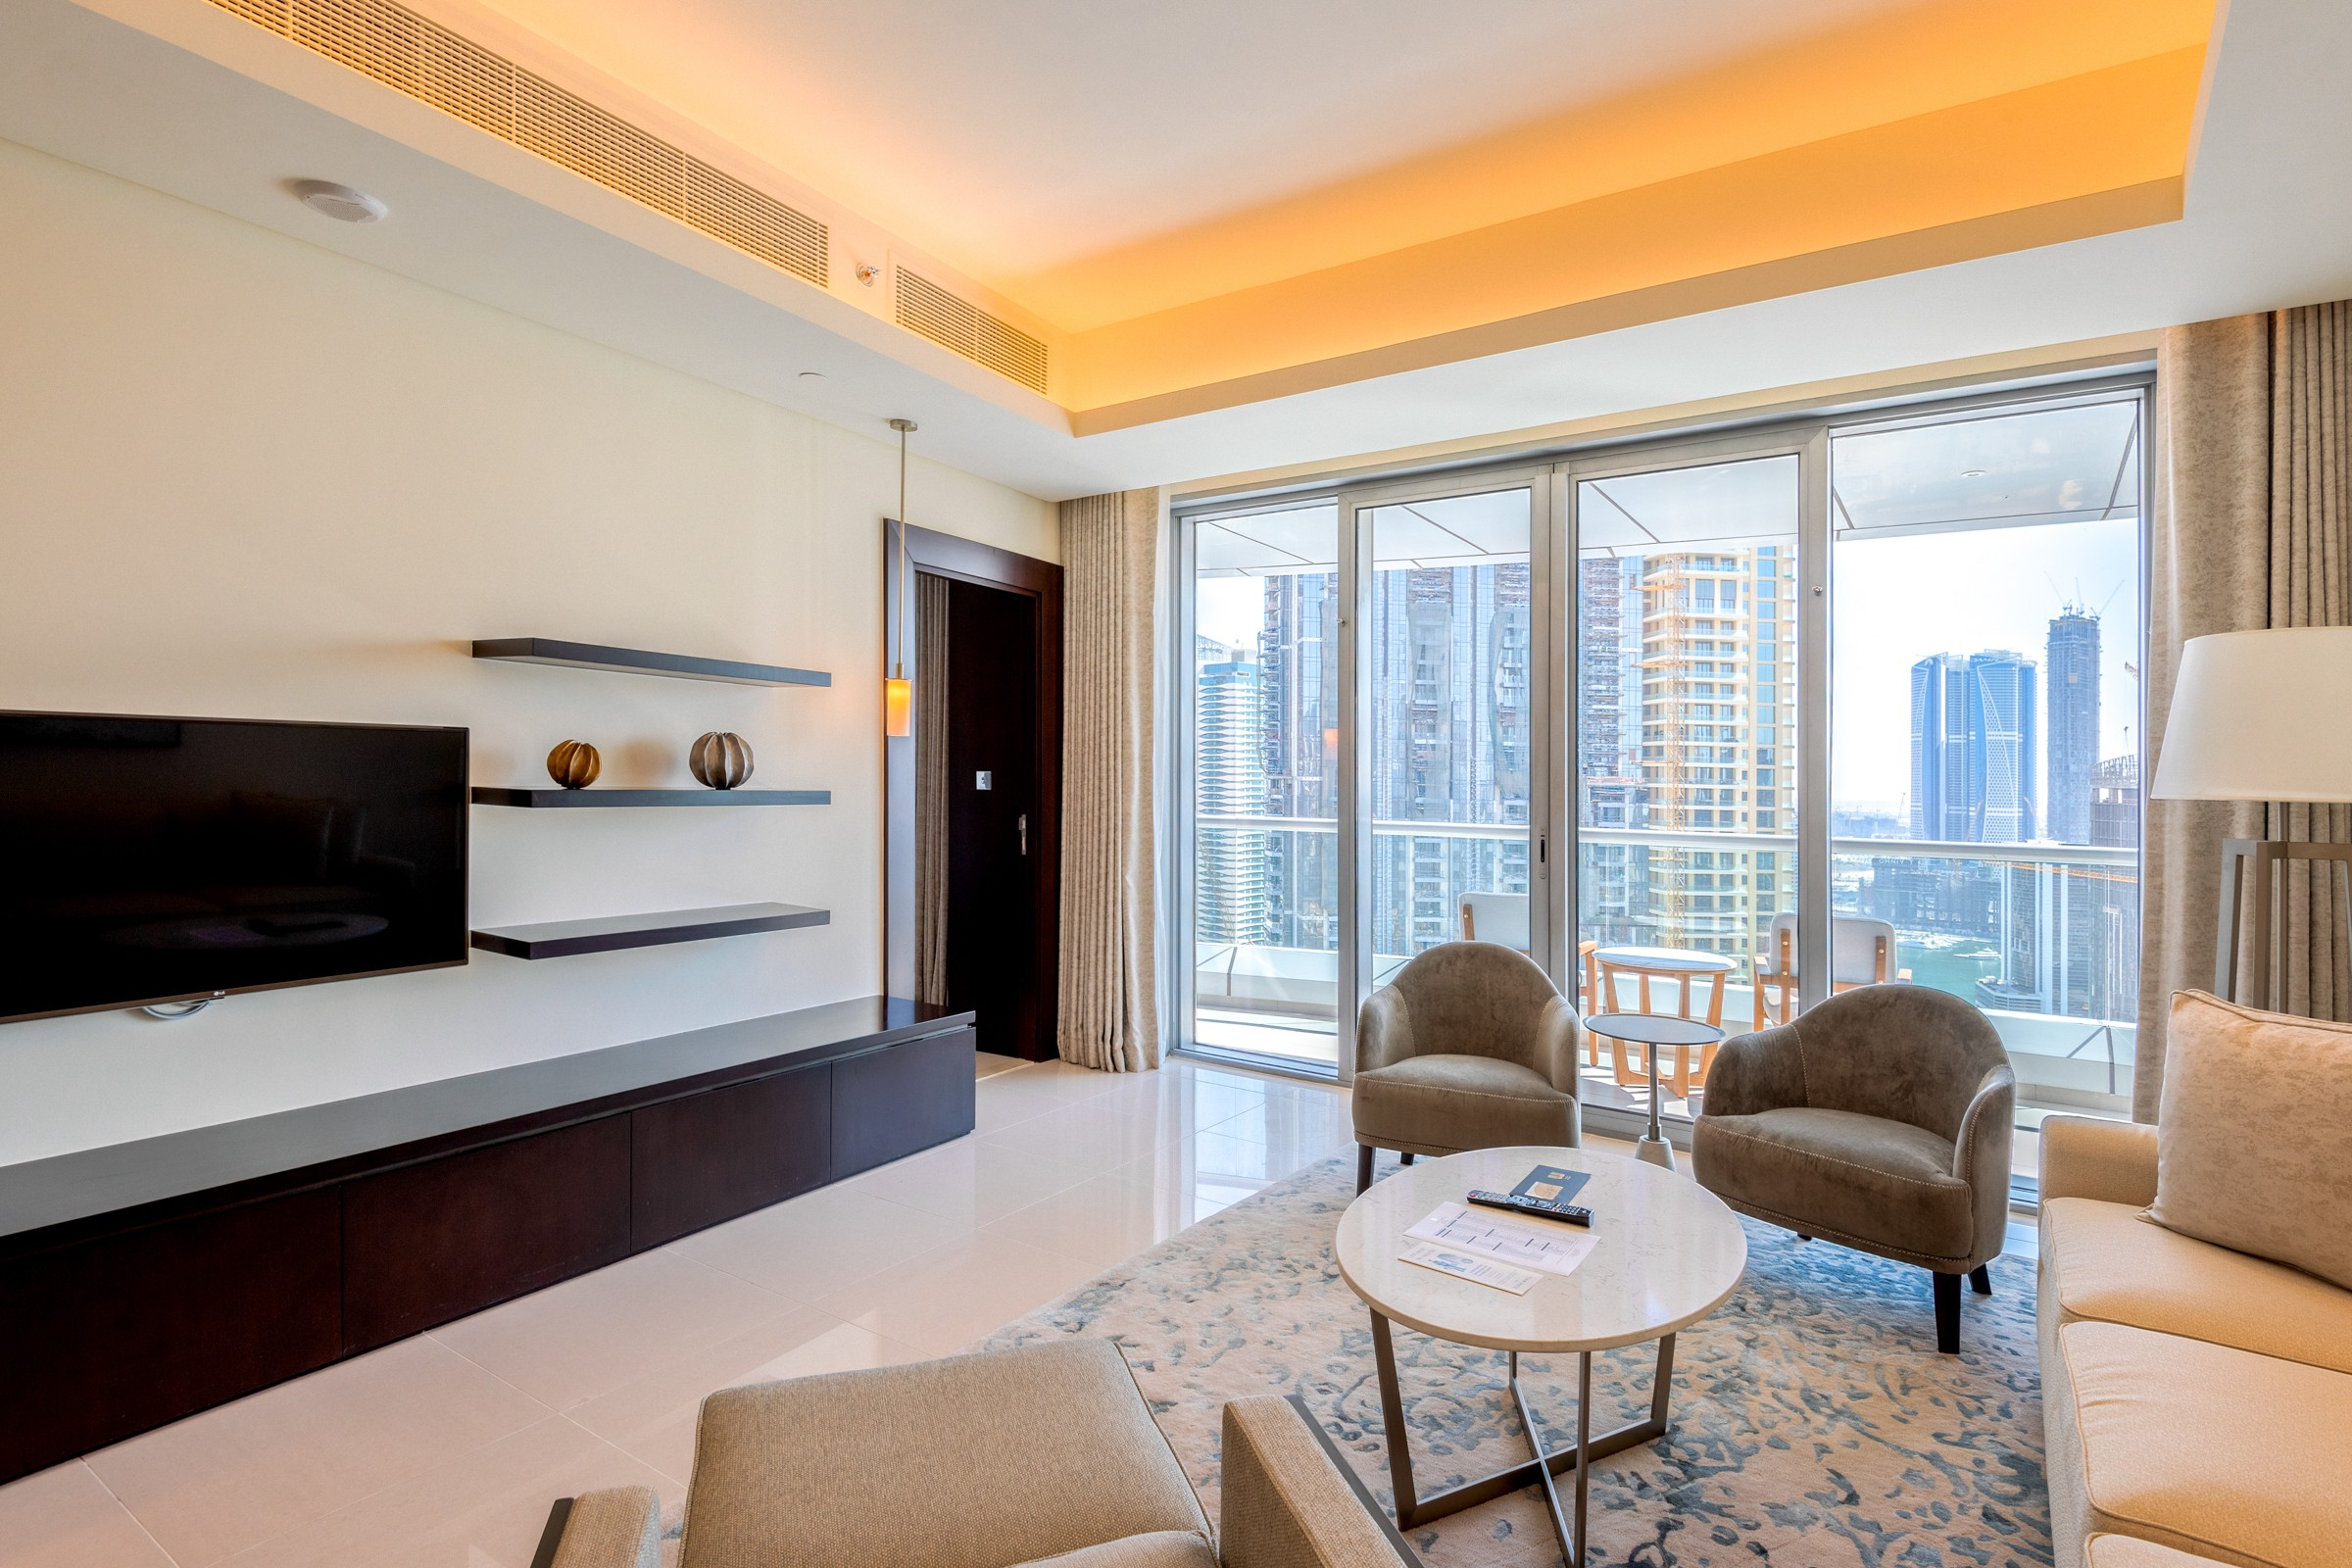 2 BR   High floor   with Euphoric Fountain Views